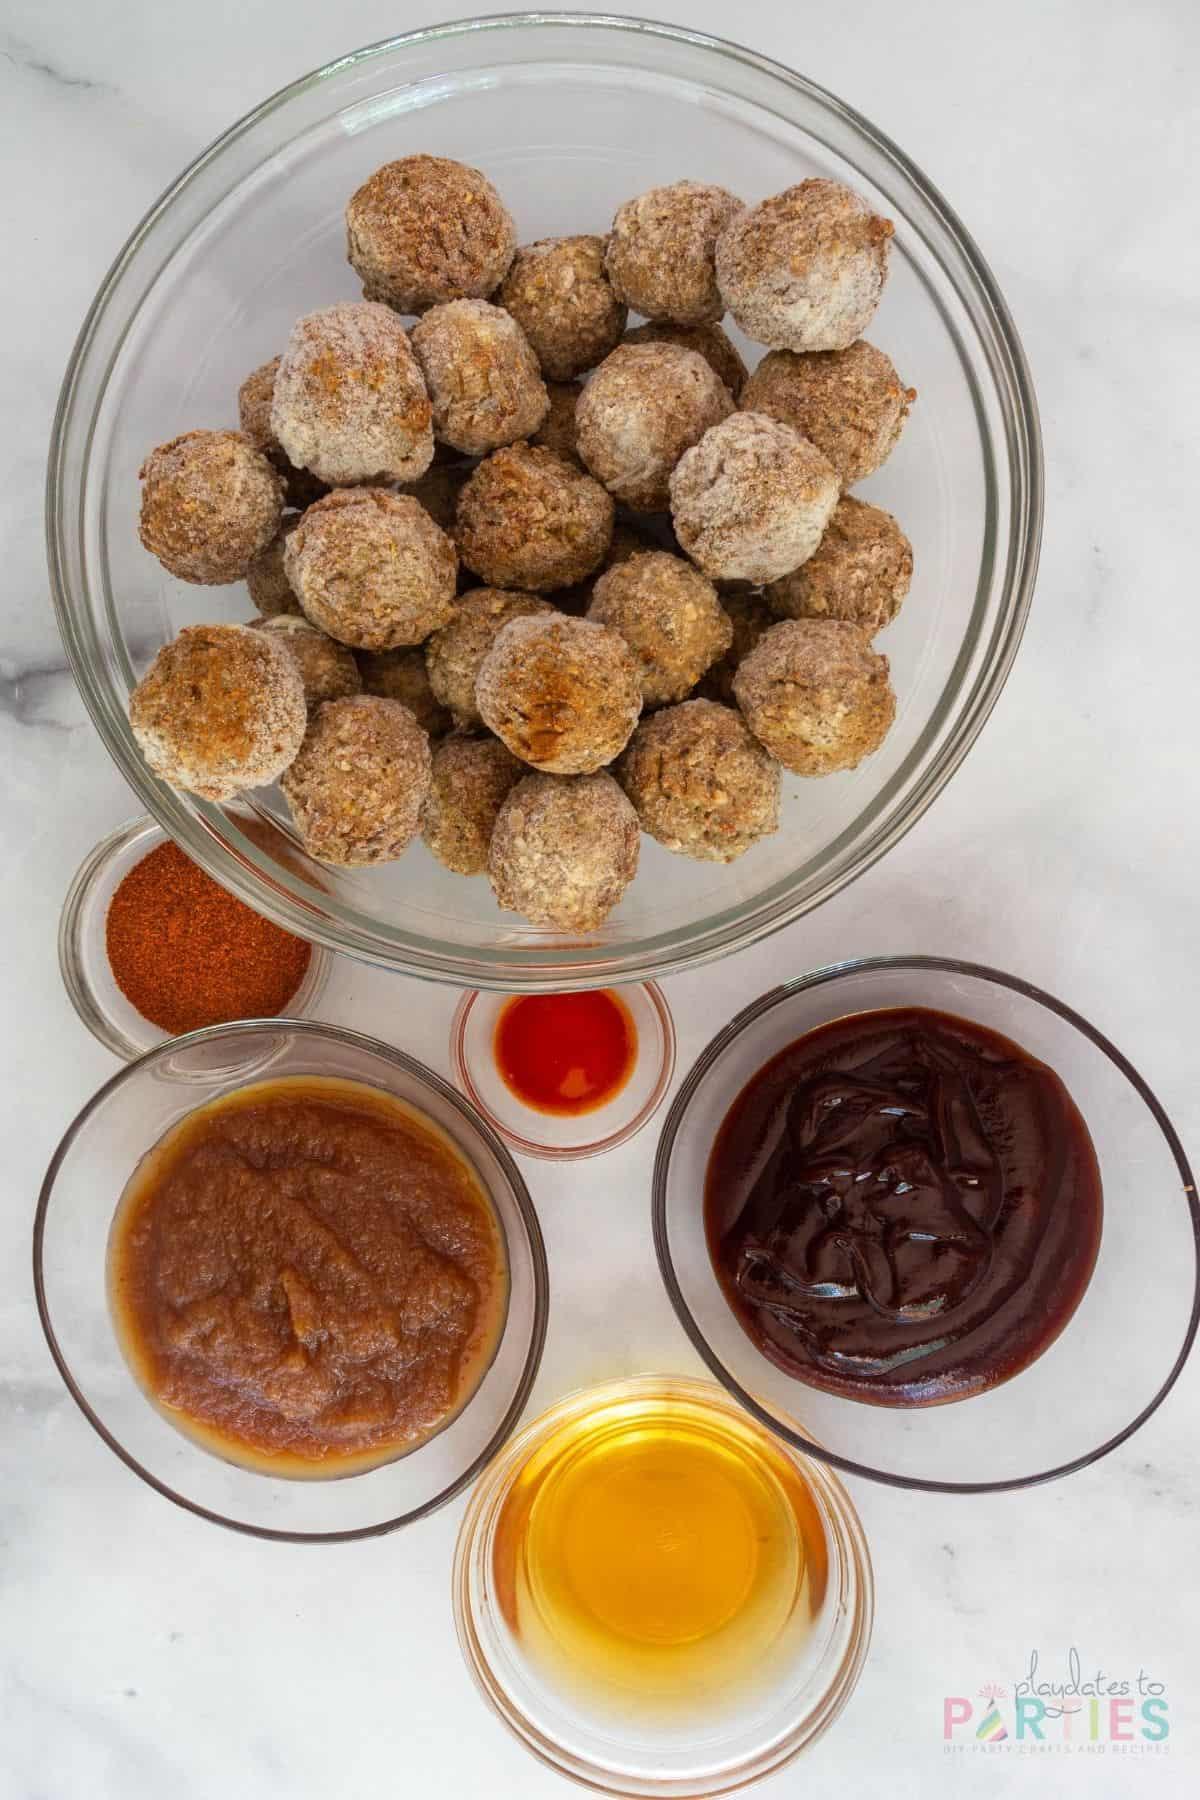 ingredients for crock pot apple butter meatballs